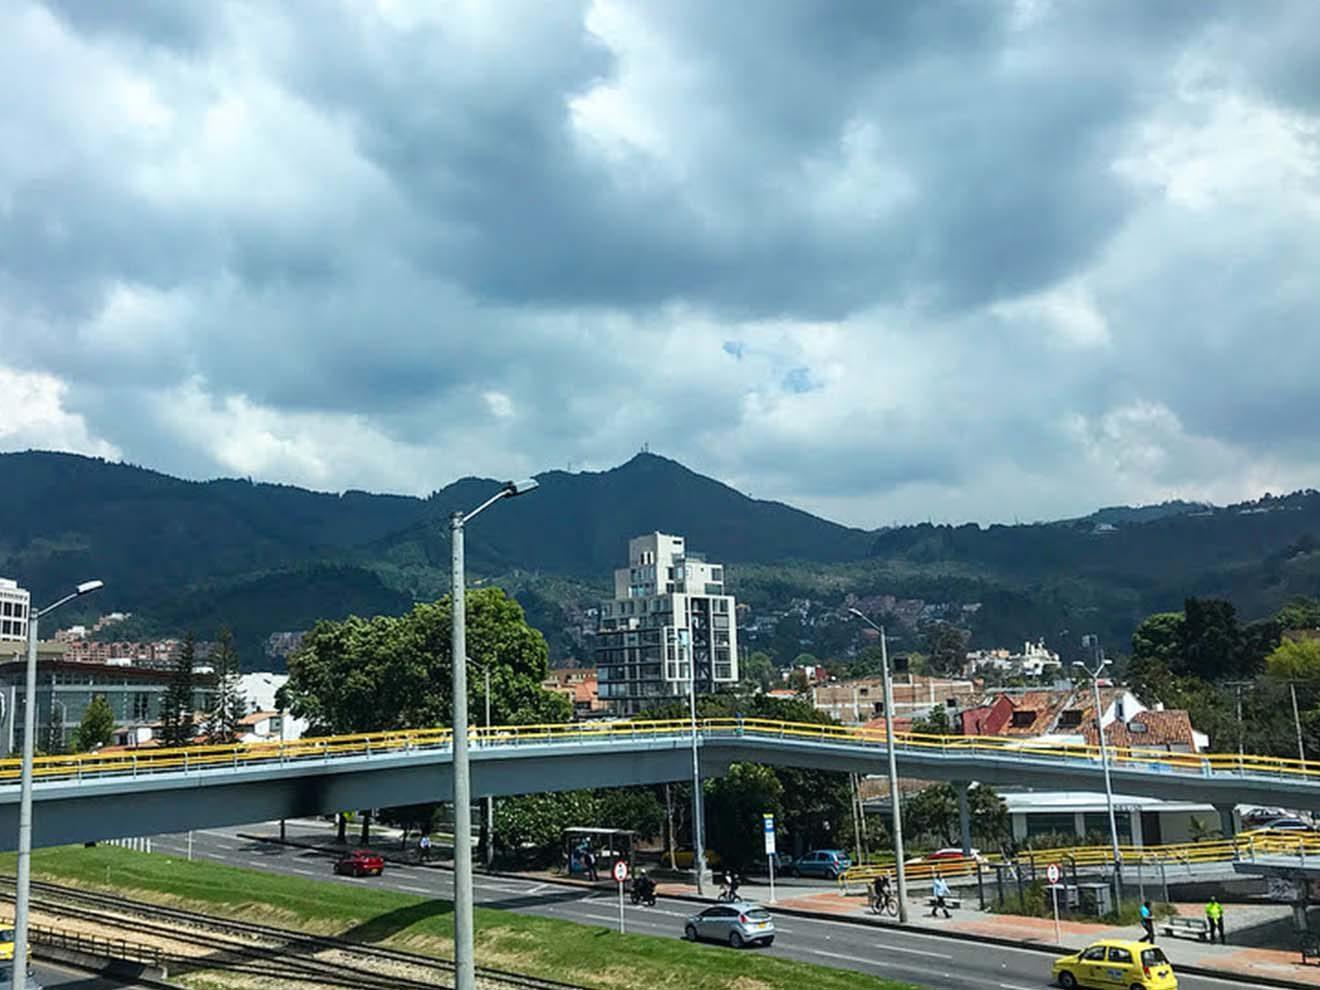 North of Bogotá